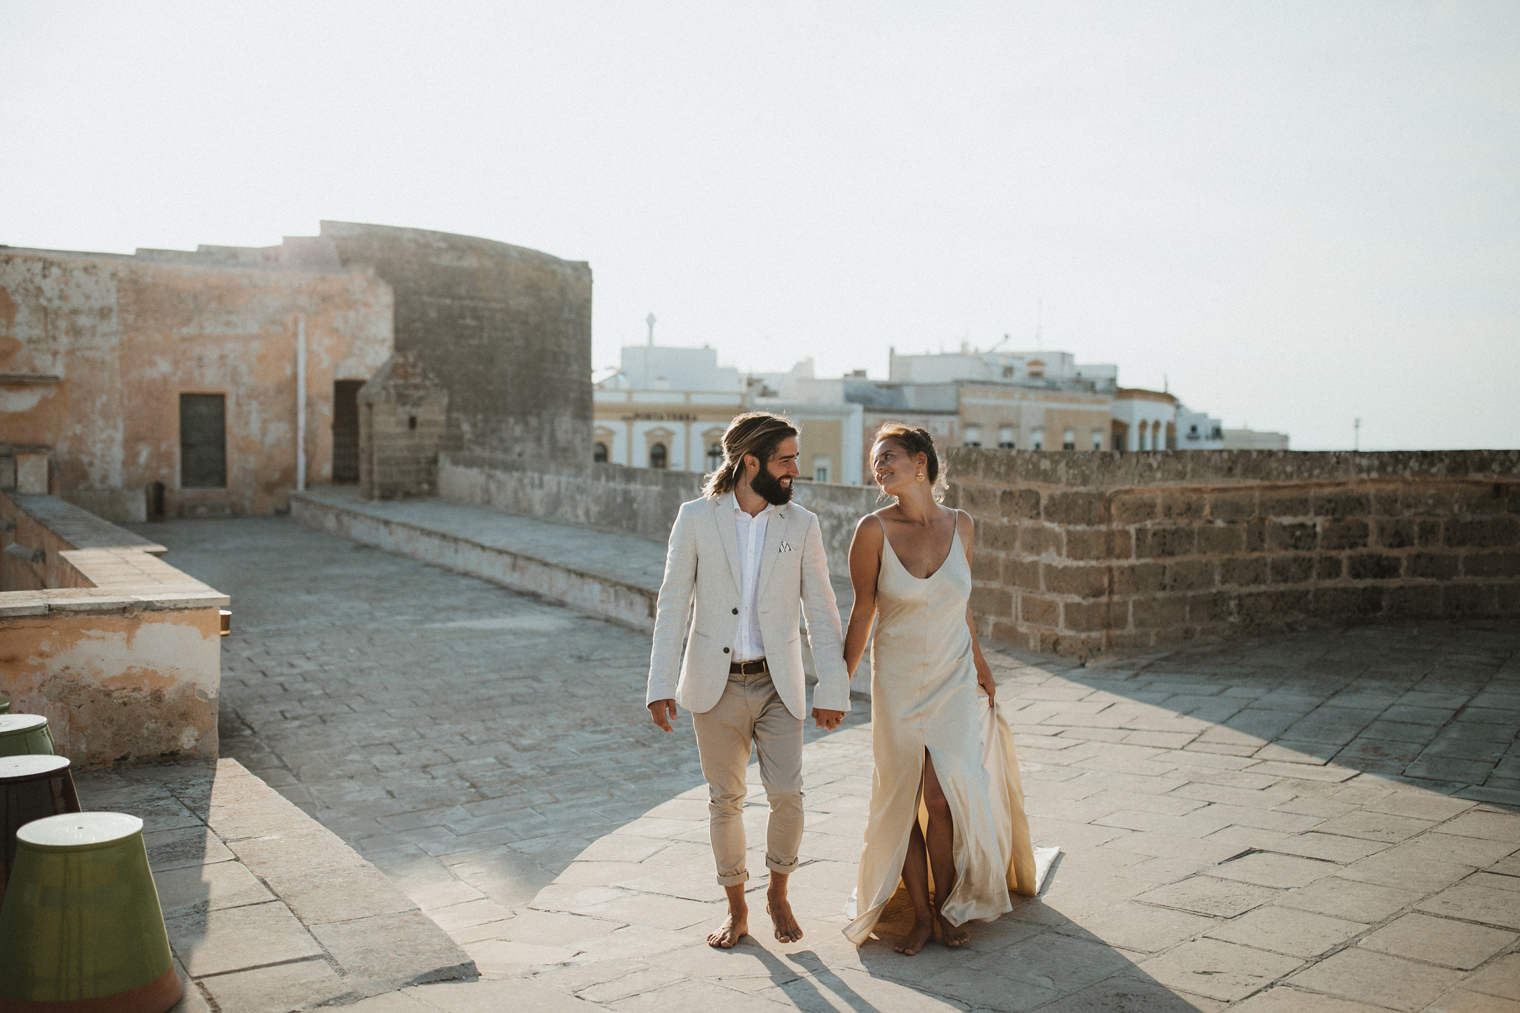 couple walking together at Castello di Gallipoli